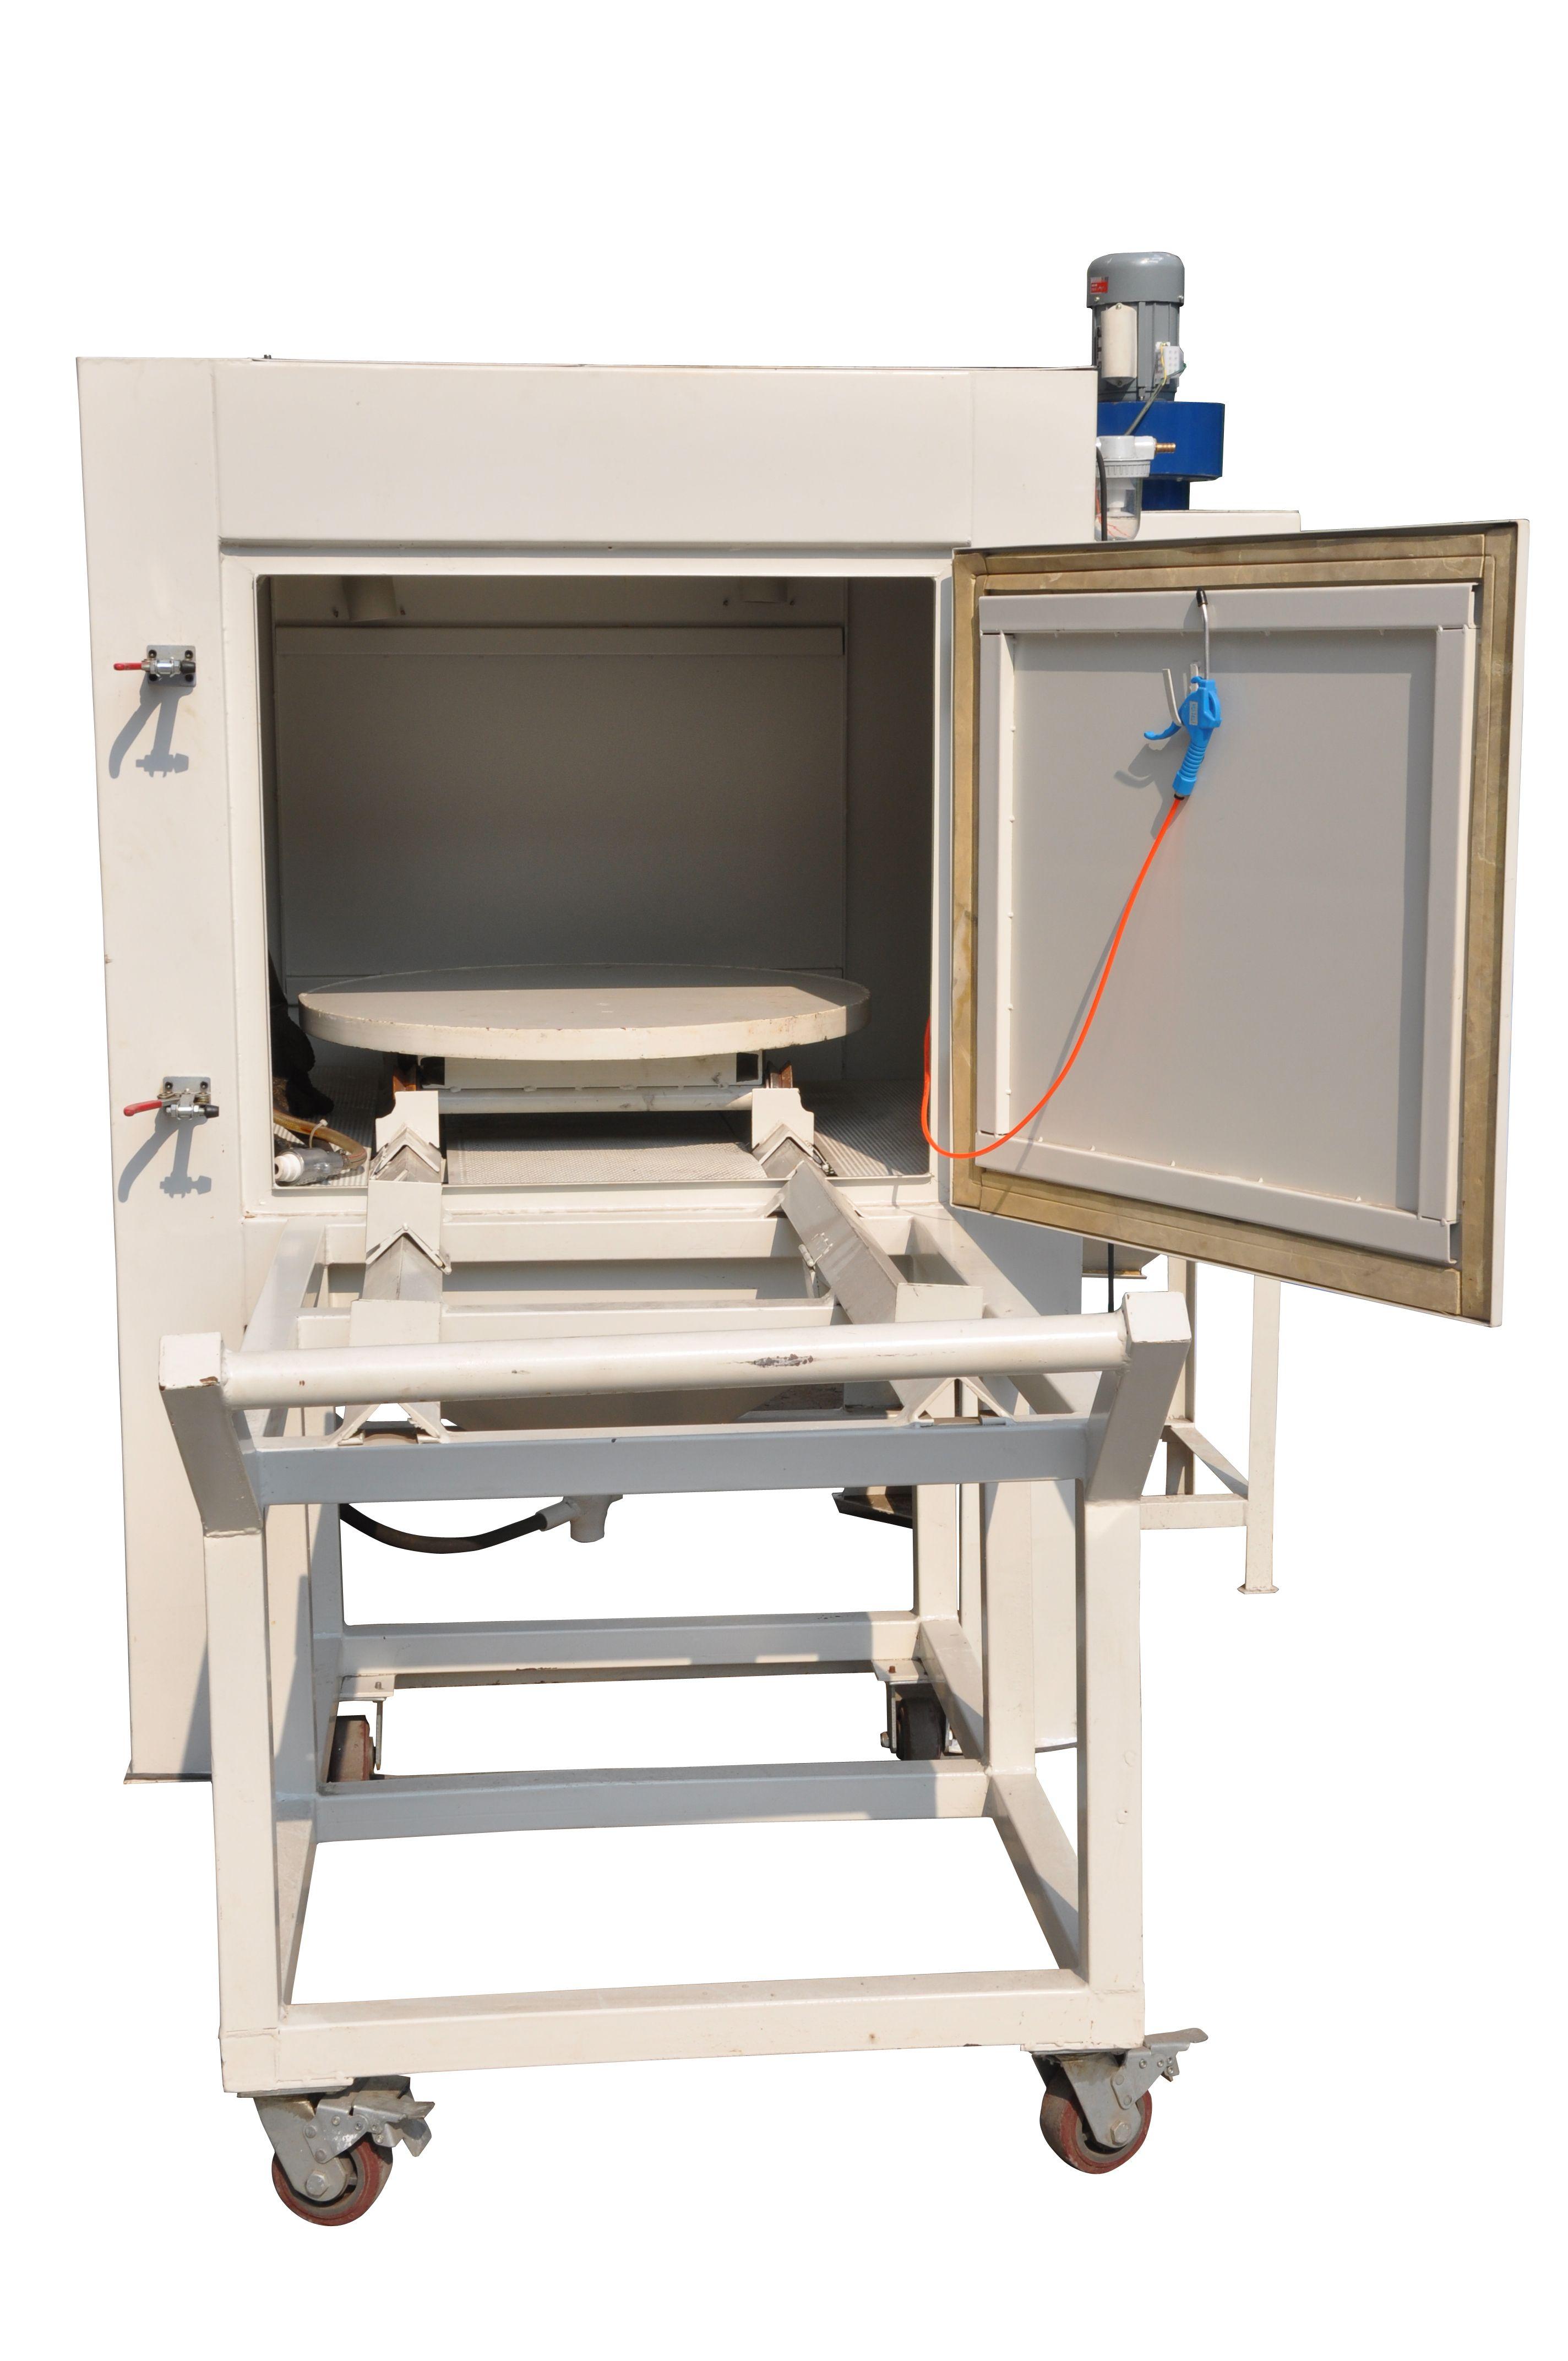 us id en shot original sand cabinet model catalogue auction heath industrial dayton blast lot catalogues